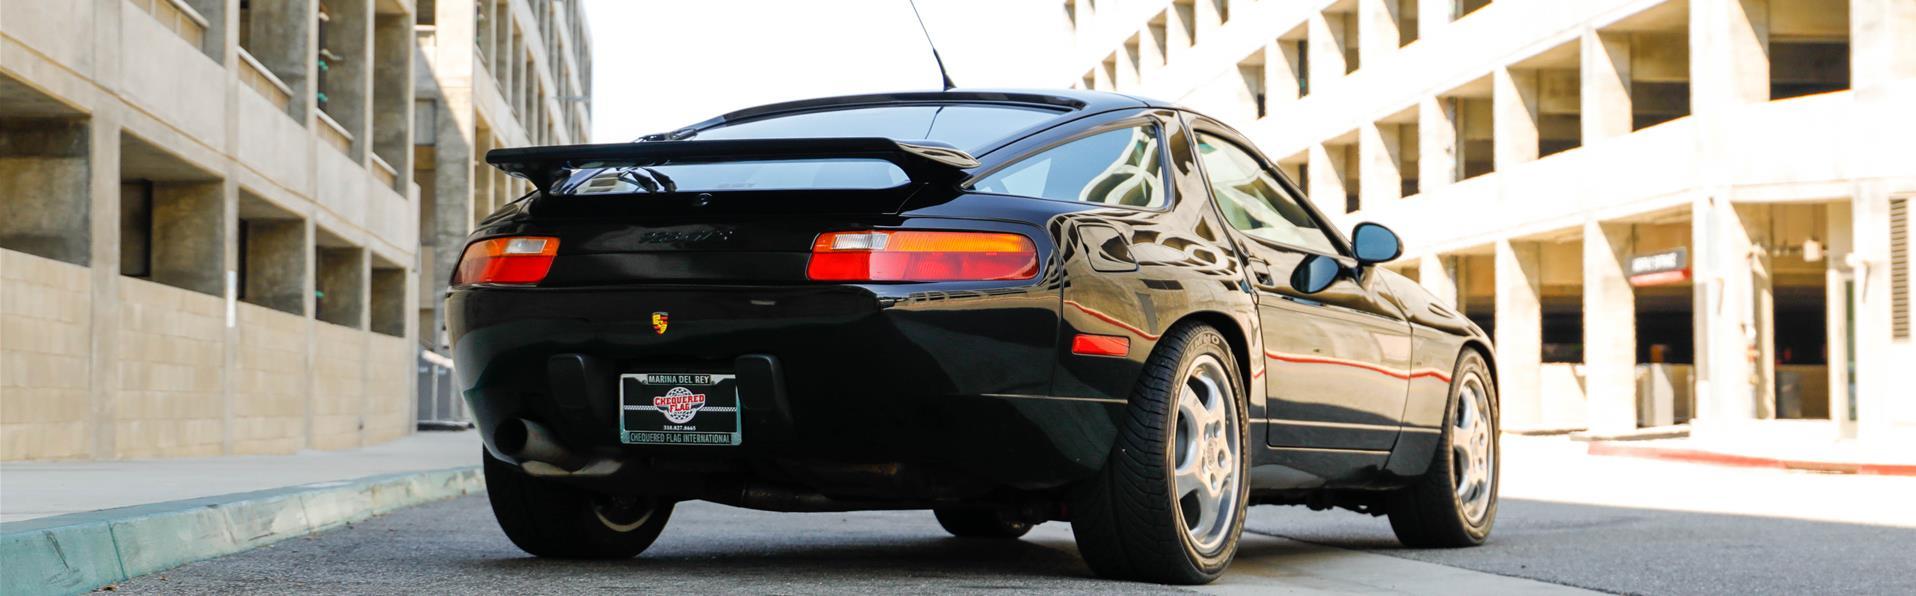 Classic Sports Cars Marina Del Rey Ca Exotic Collectible Fuel Filter 1983 Mercedes Benz 280sl Chequered Flag